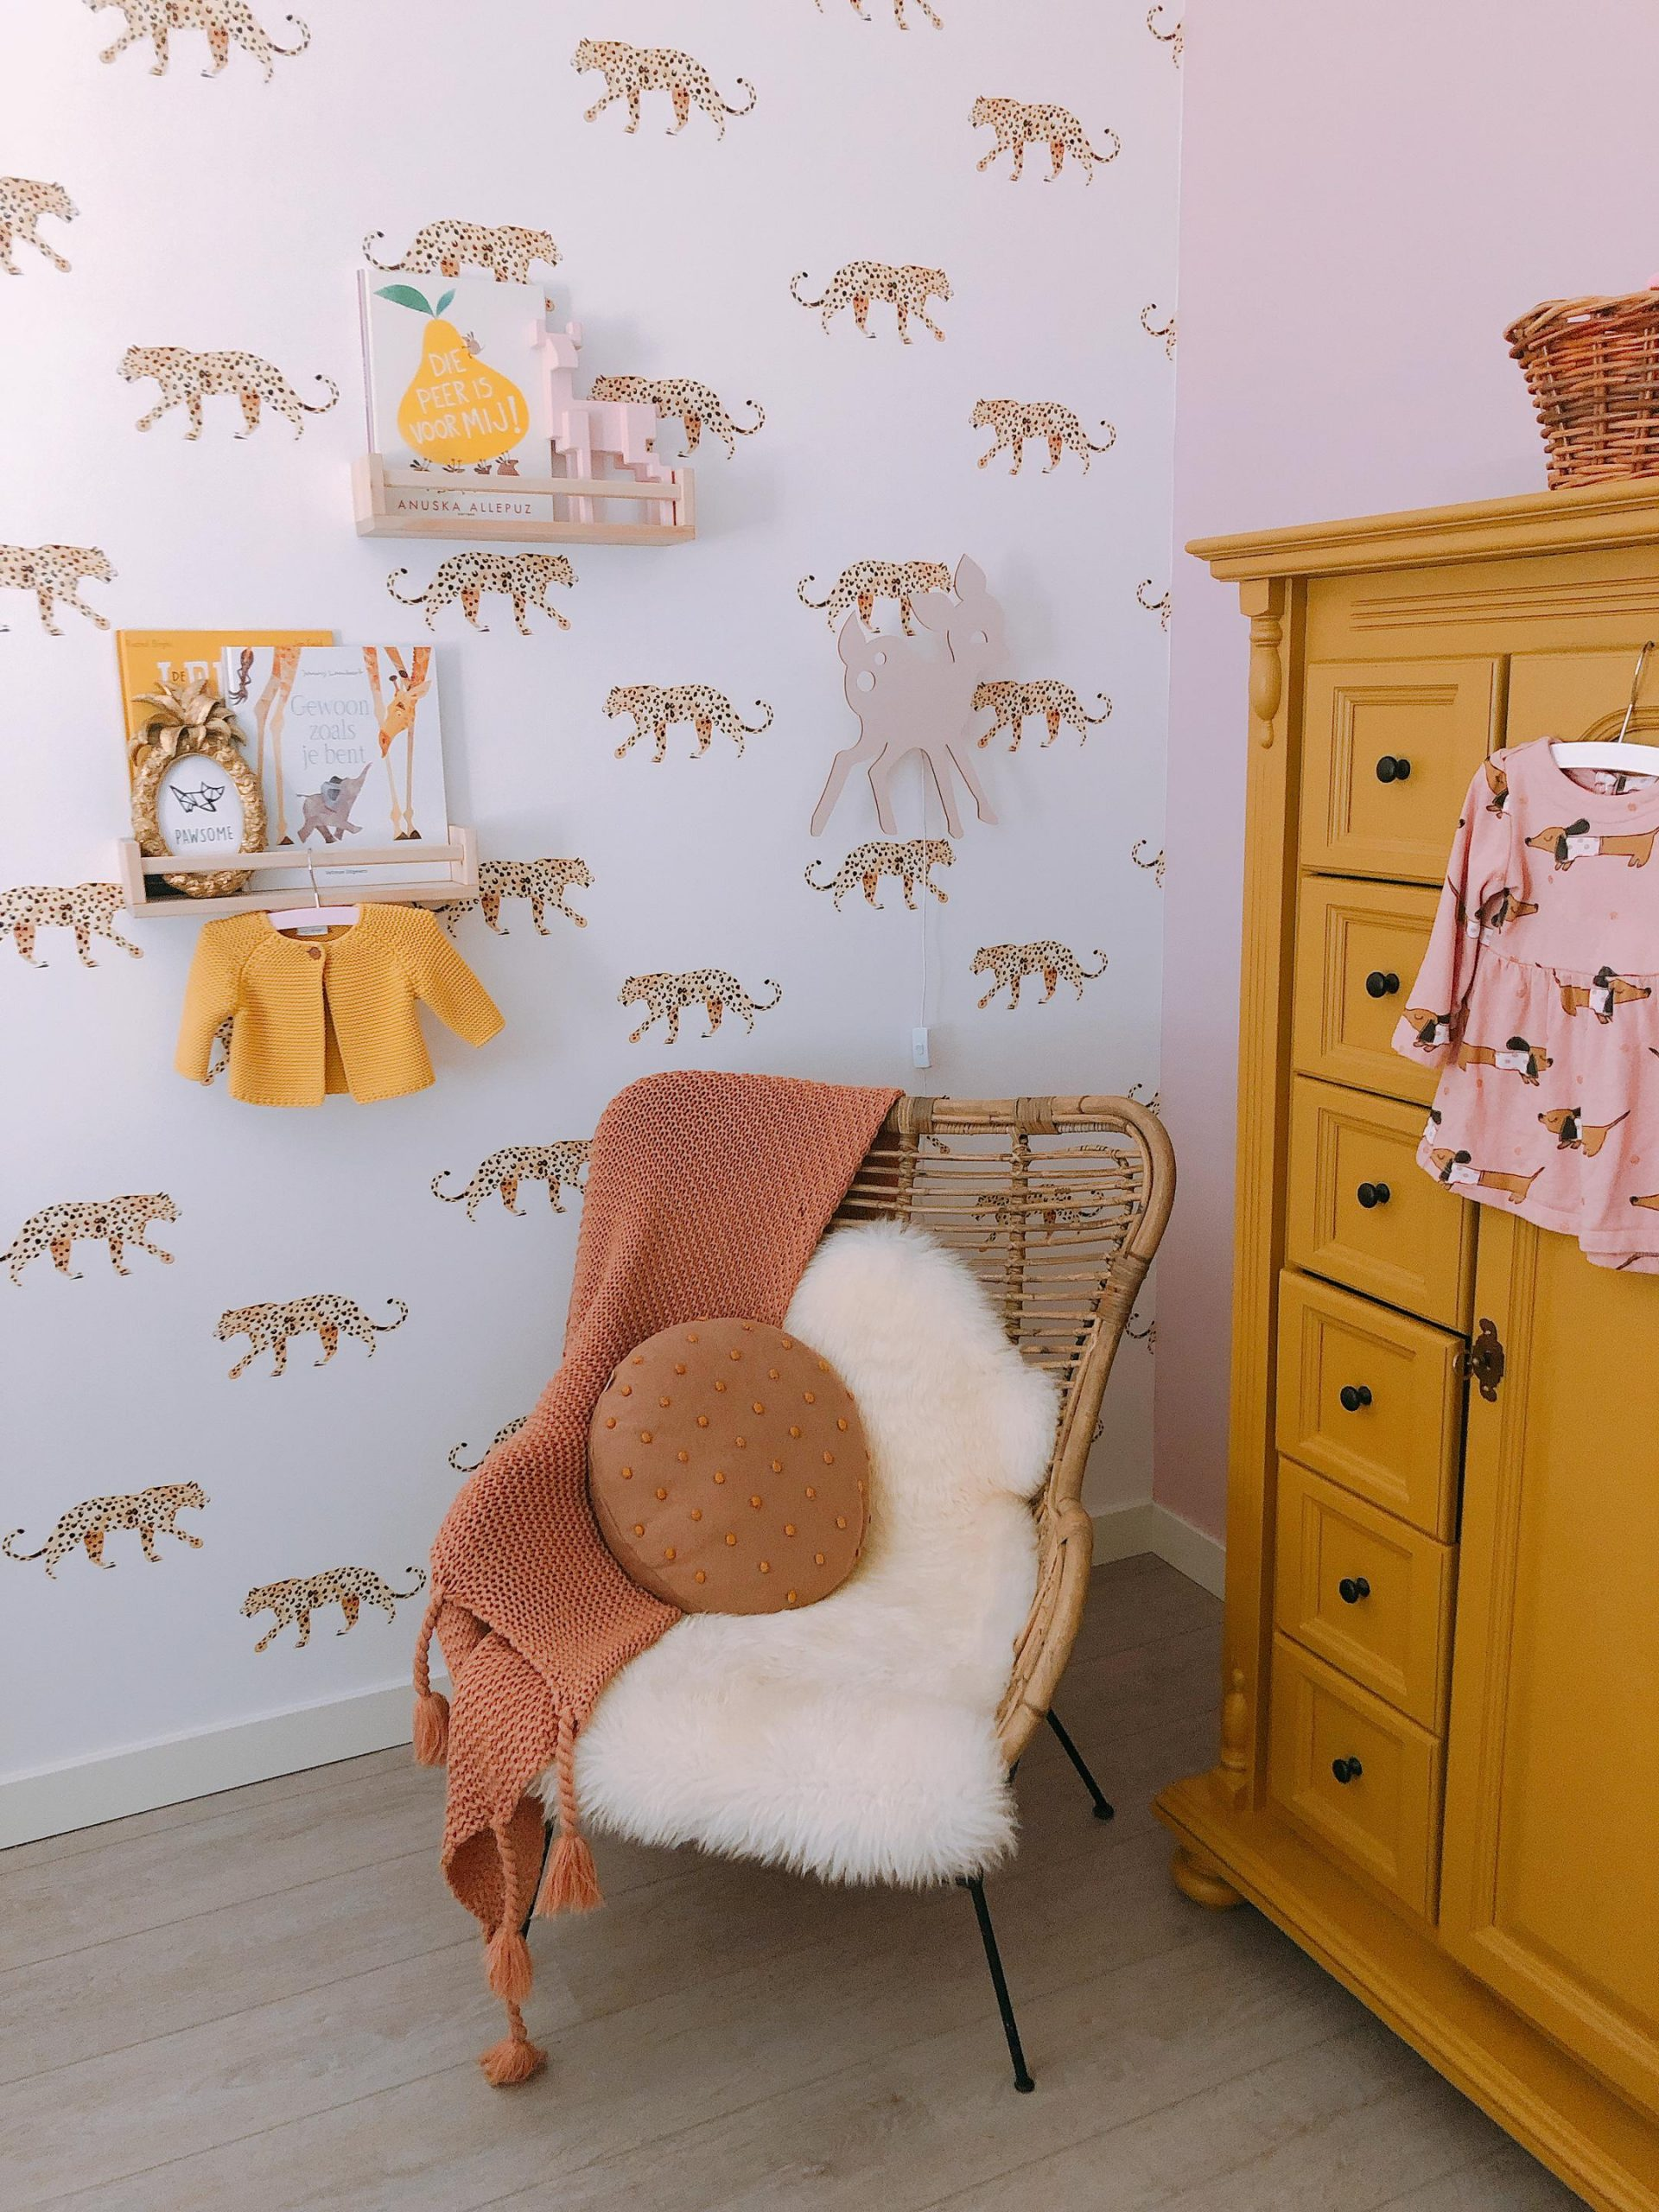 IMG 6948 2160x2880 1 scaled - De baby/kinderkamer van Hazel - roze, hout & marmer!